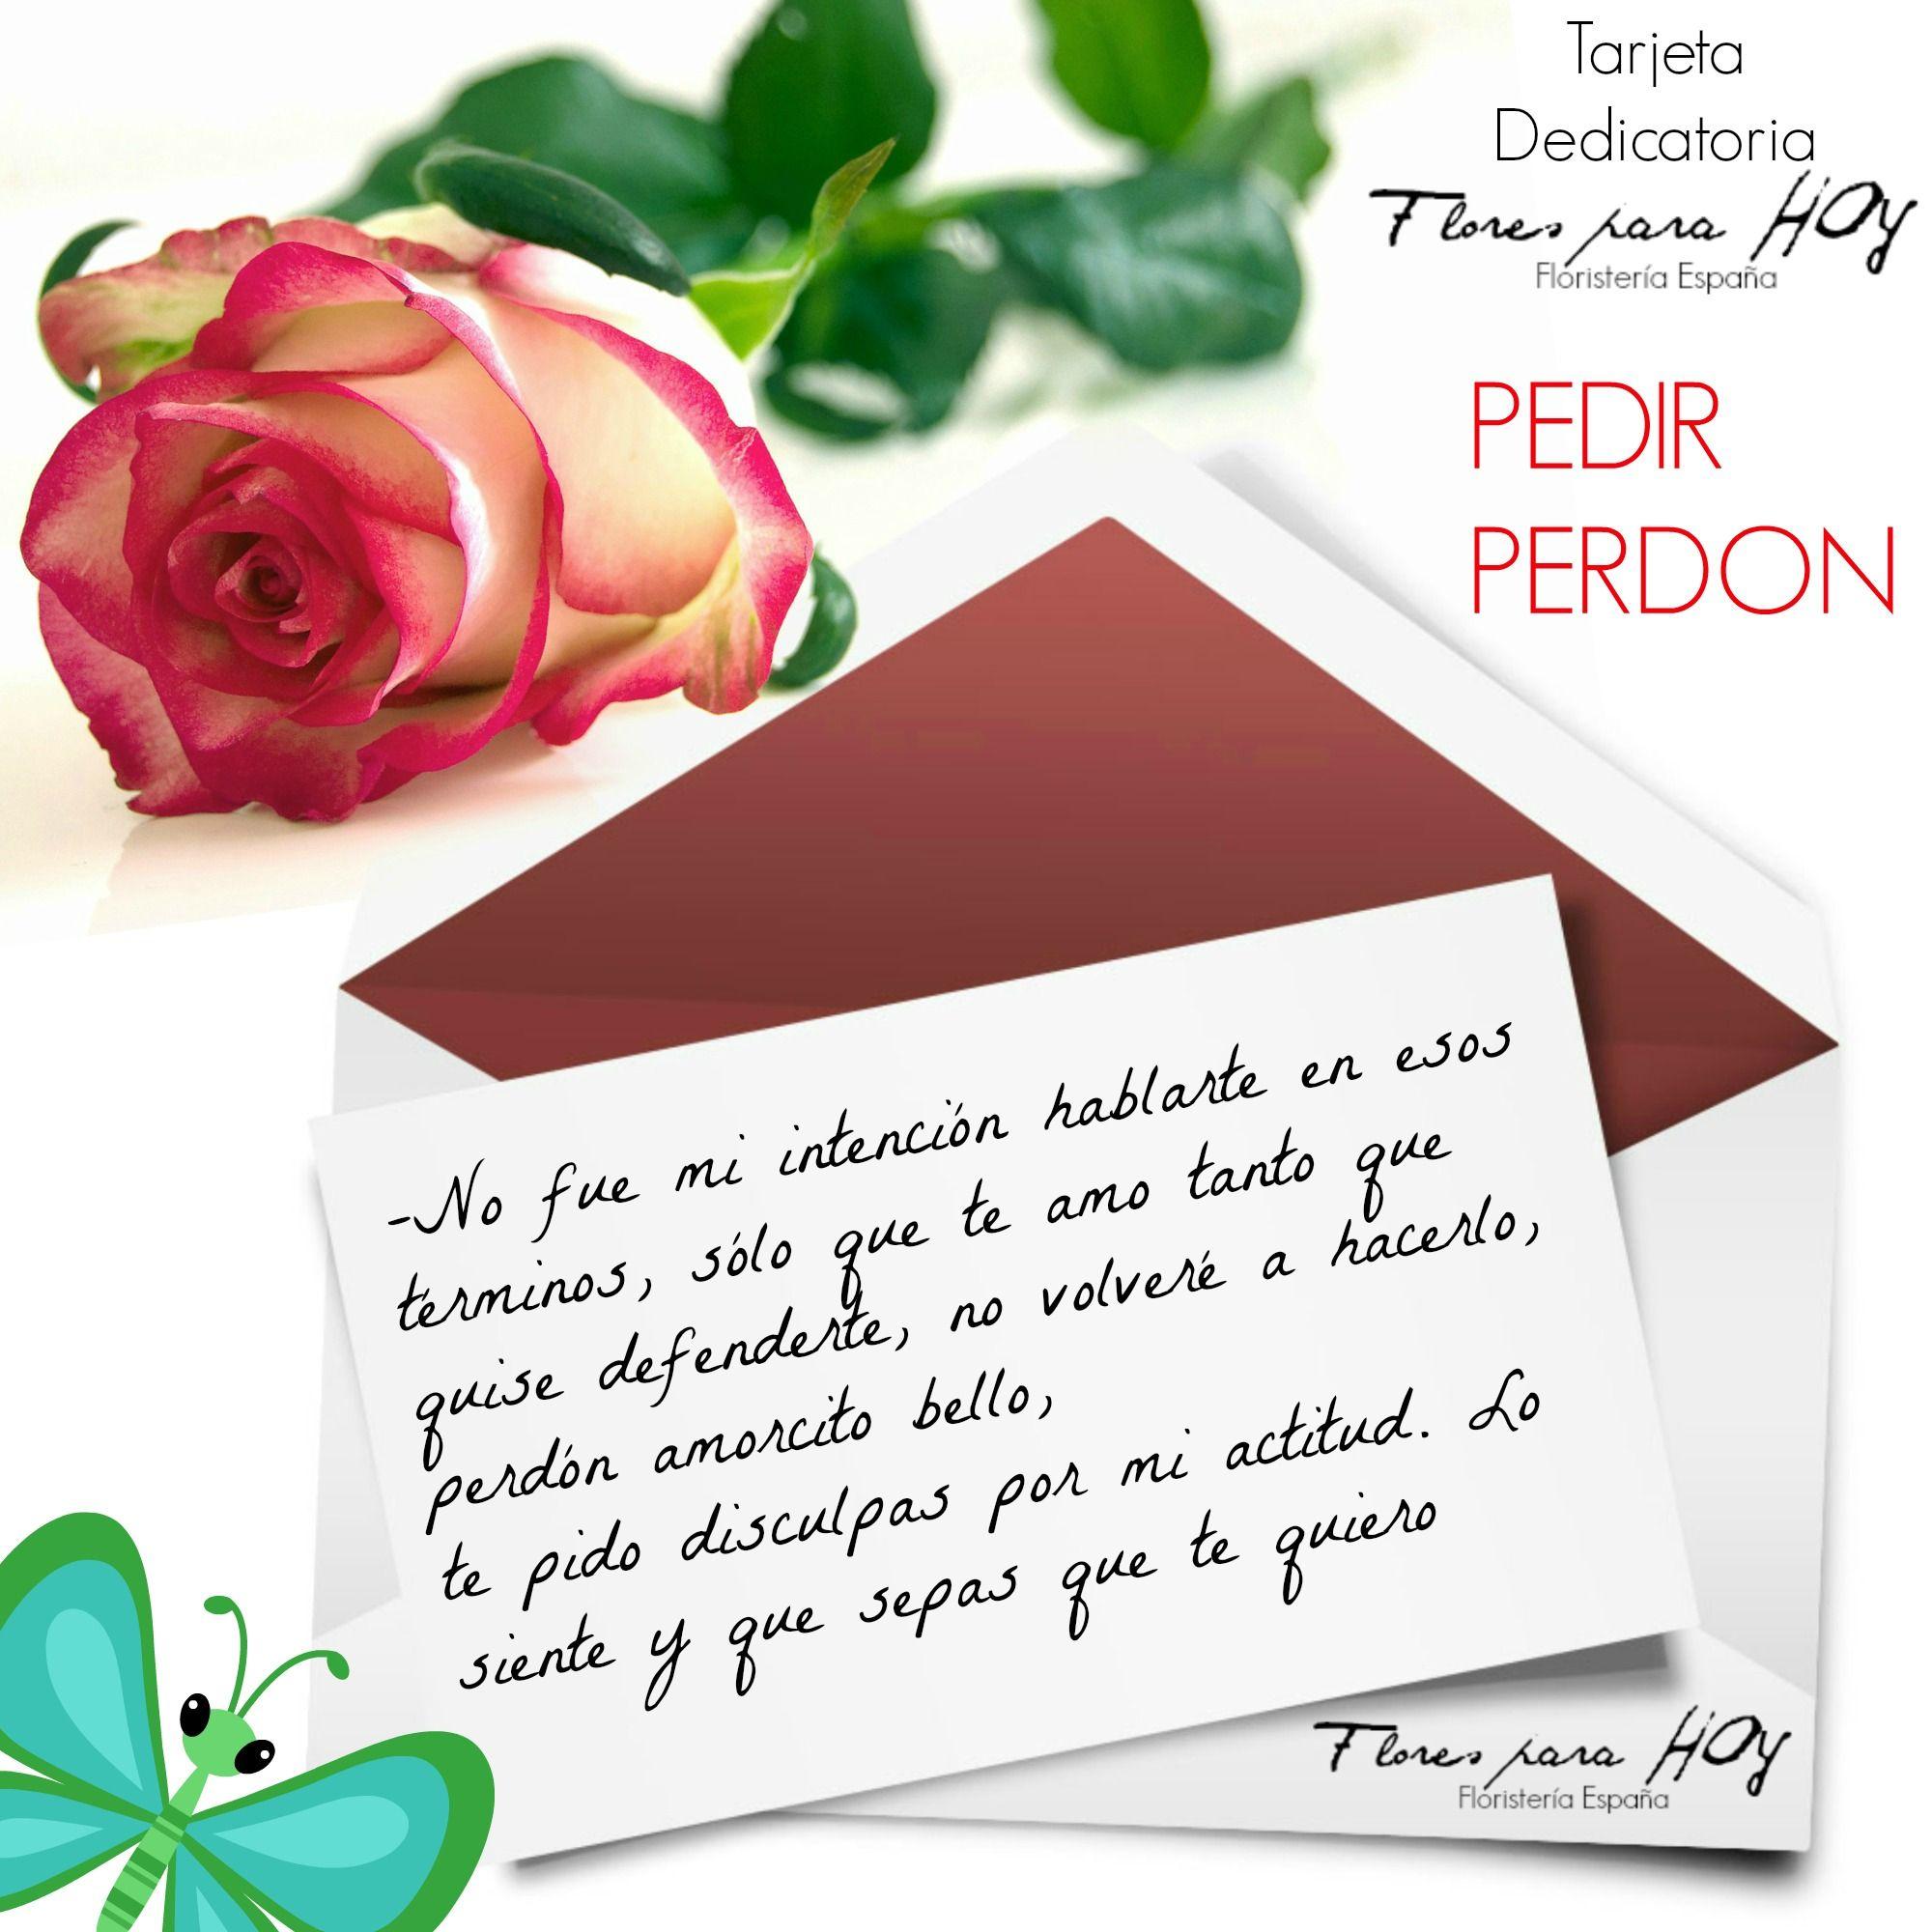 Ideas para escribir en tu tarjeta dedicatoria junto a tu ramo de flores Frases AmorPedir Perd³nRamo